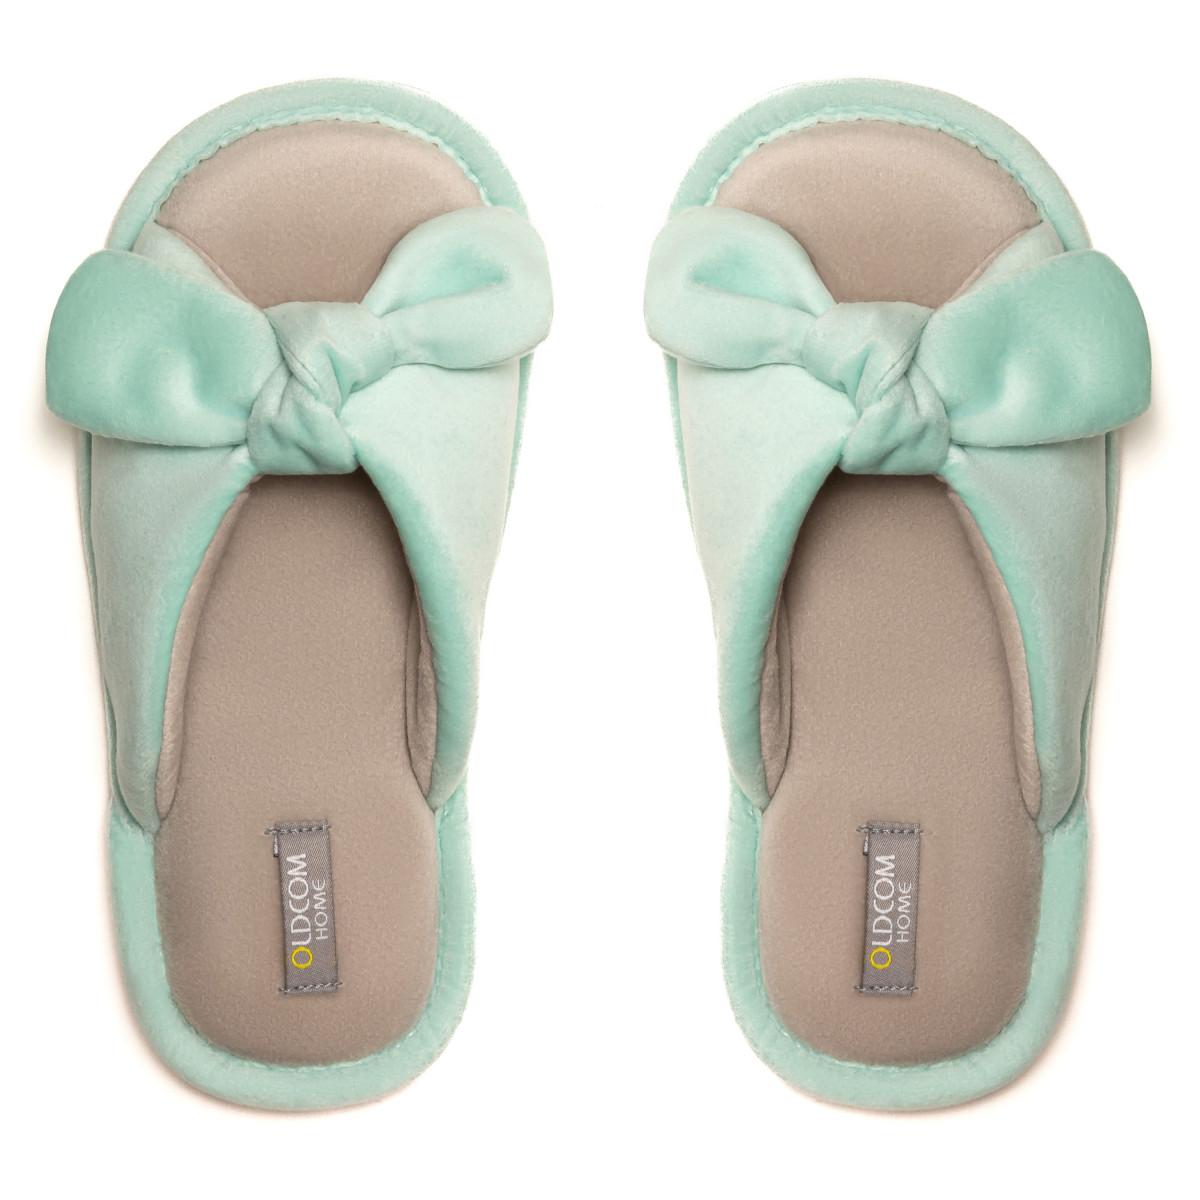 Kid's home slippers BUNNY, Mint/Beige